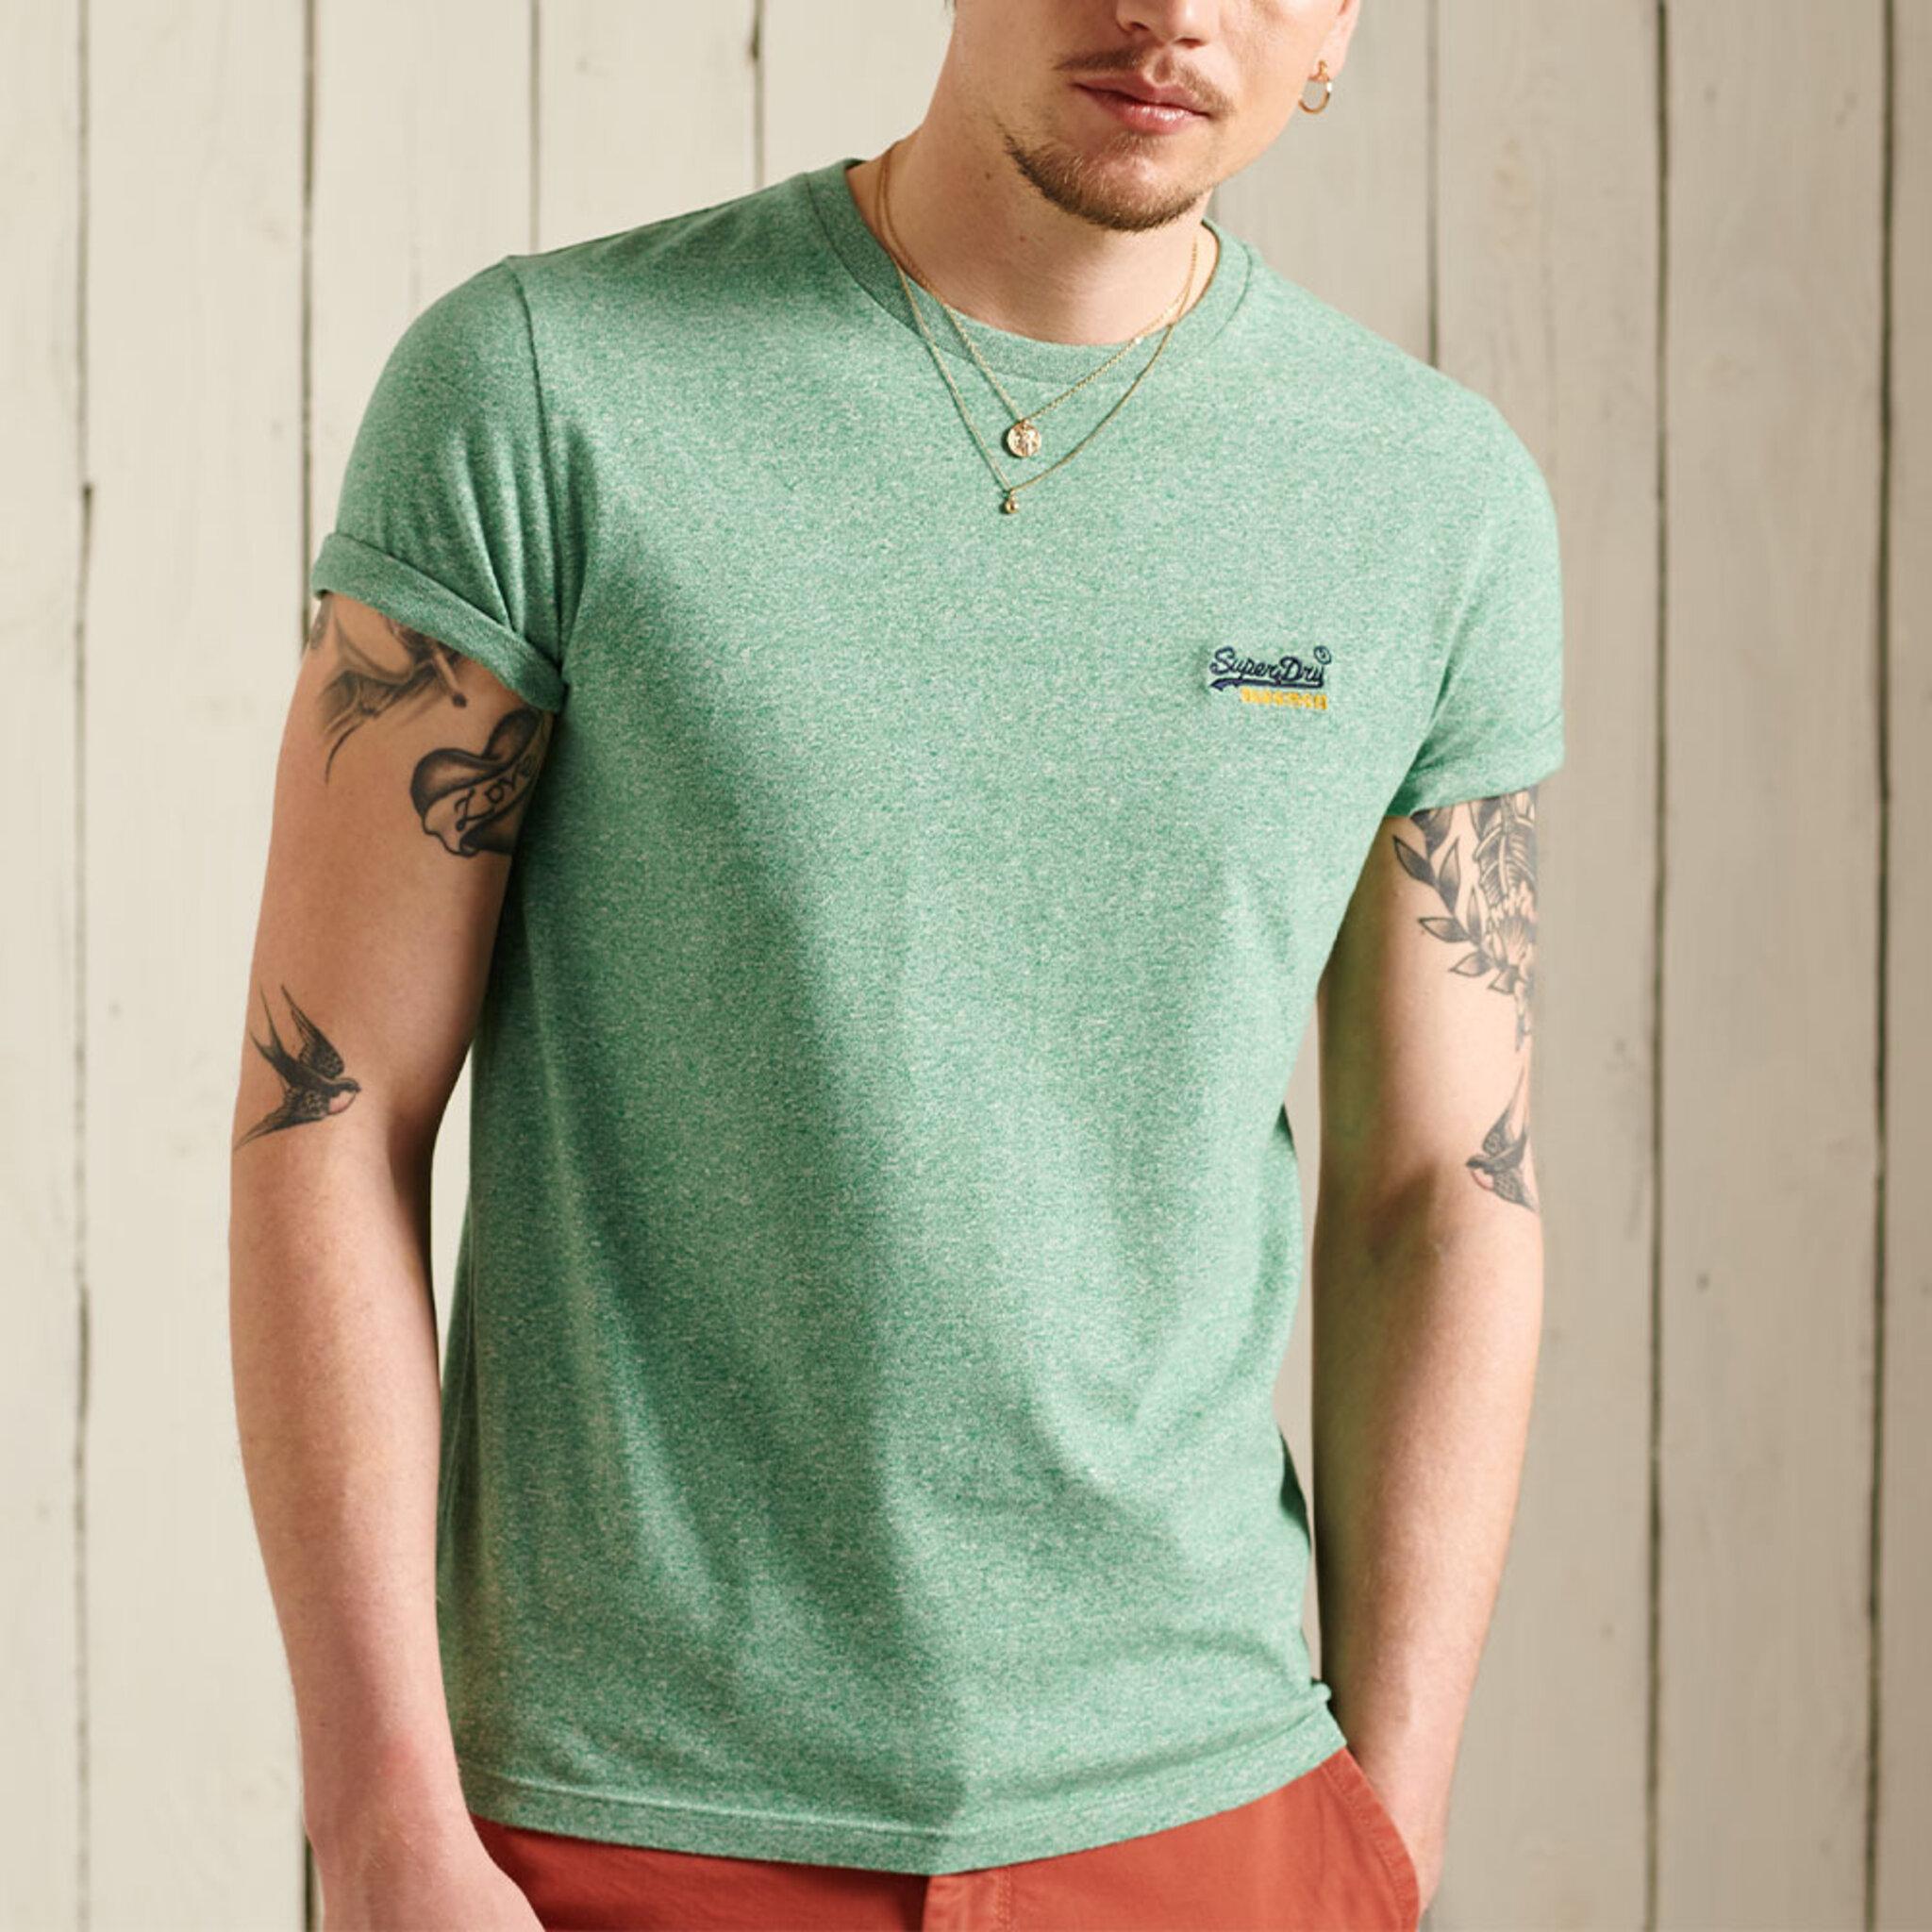 Ol Vintage Emb Tee T.Shirt